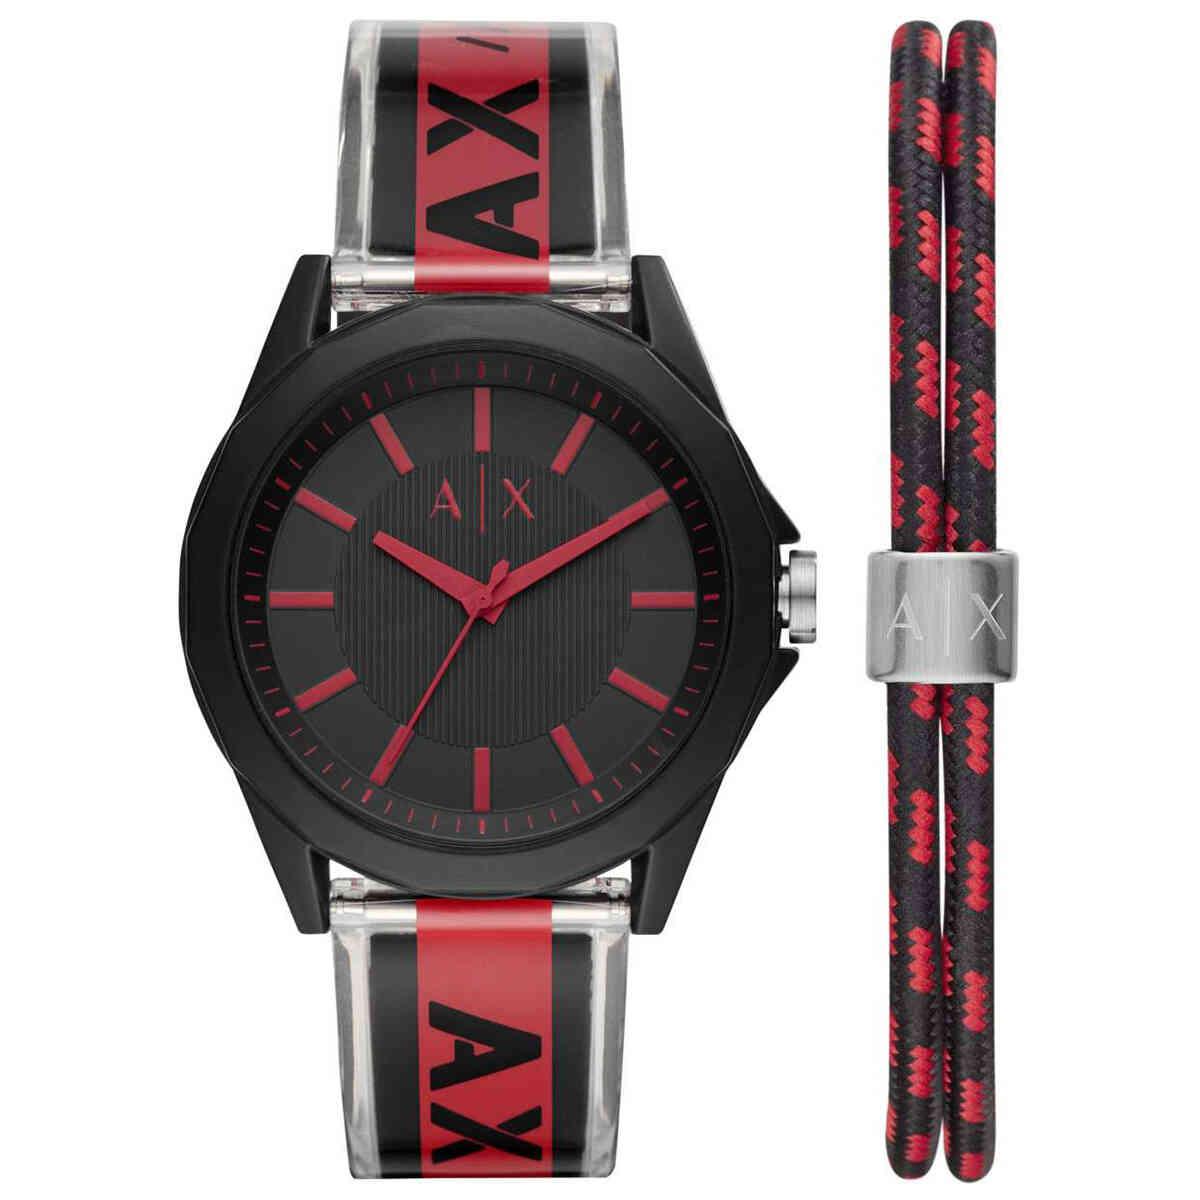 Relógio de Pulso Armani Exchange Masculino Kit com Pulseira AX7113/K8PN